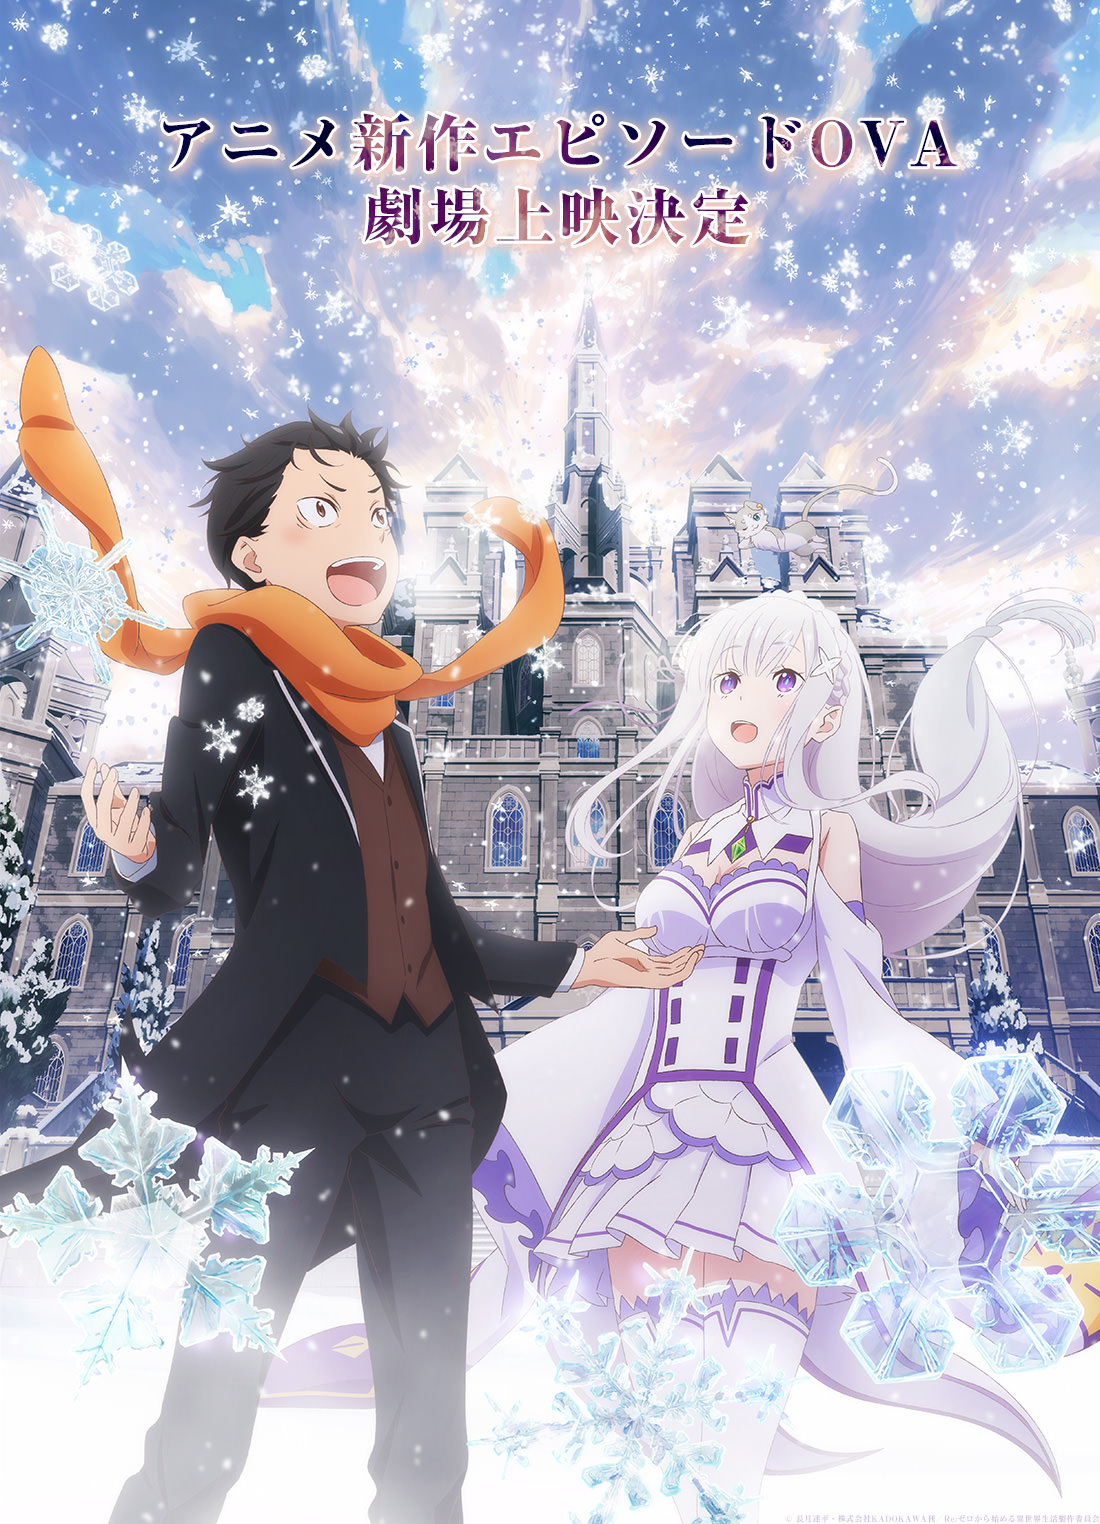 Re:Zero kara Hajimeru Isekai Seikatsu - Memory Snow / Hồi sinh thuật OVA : Kí ức ngày tuyết rơi